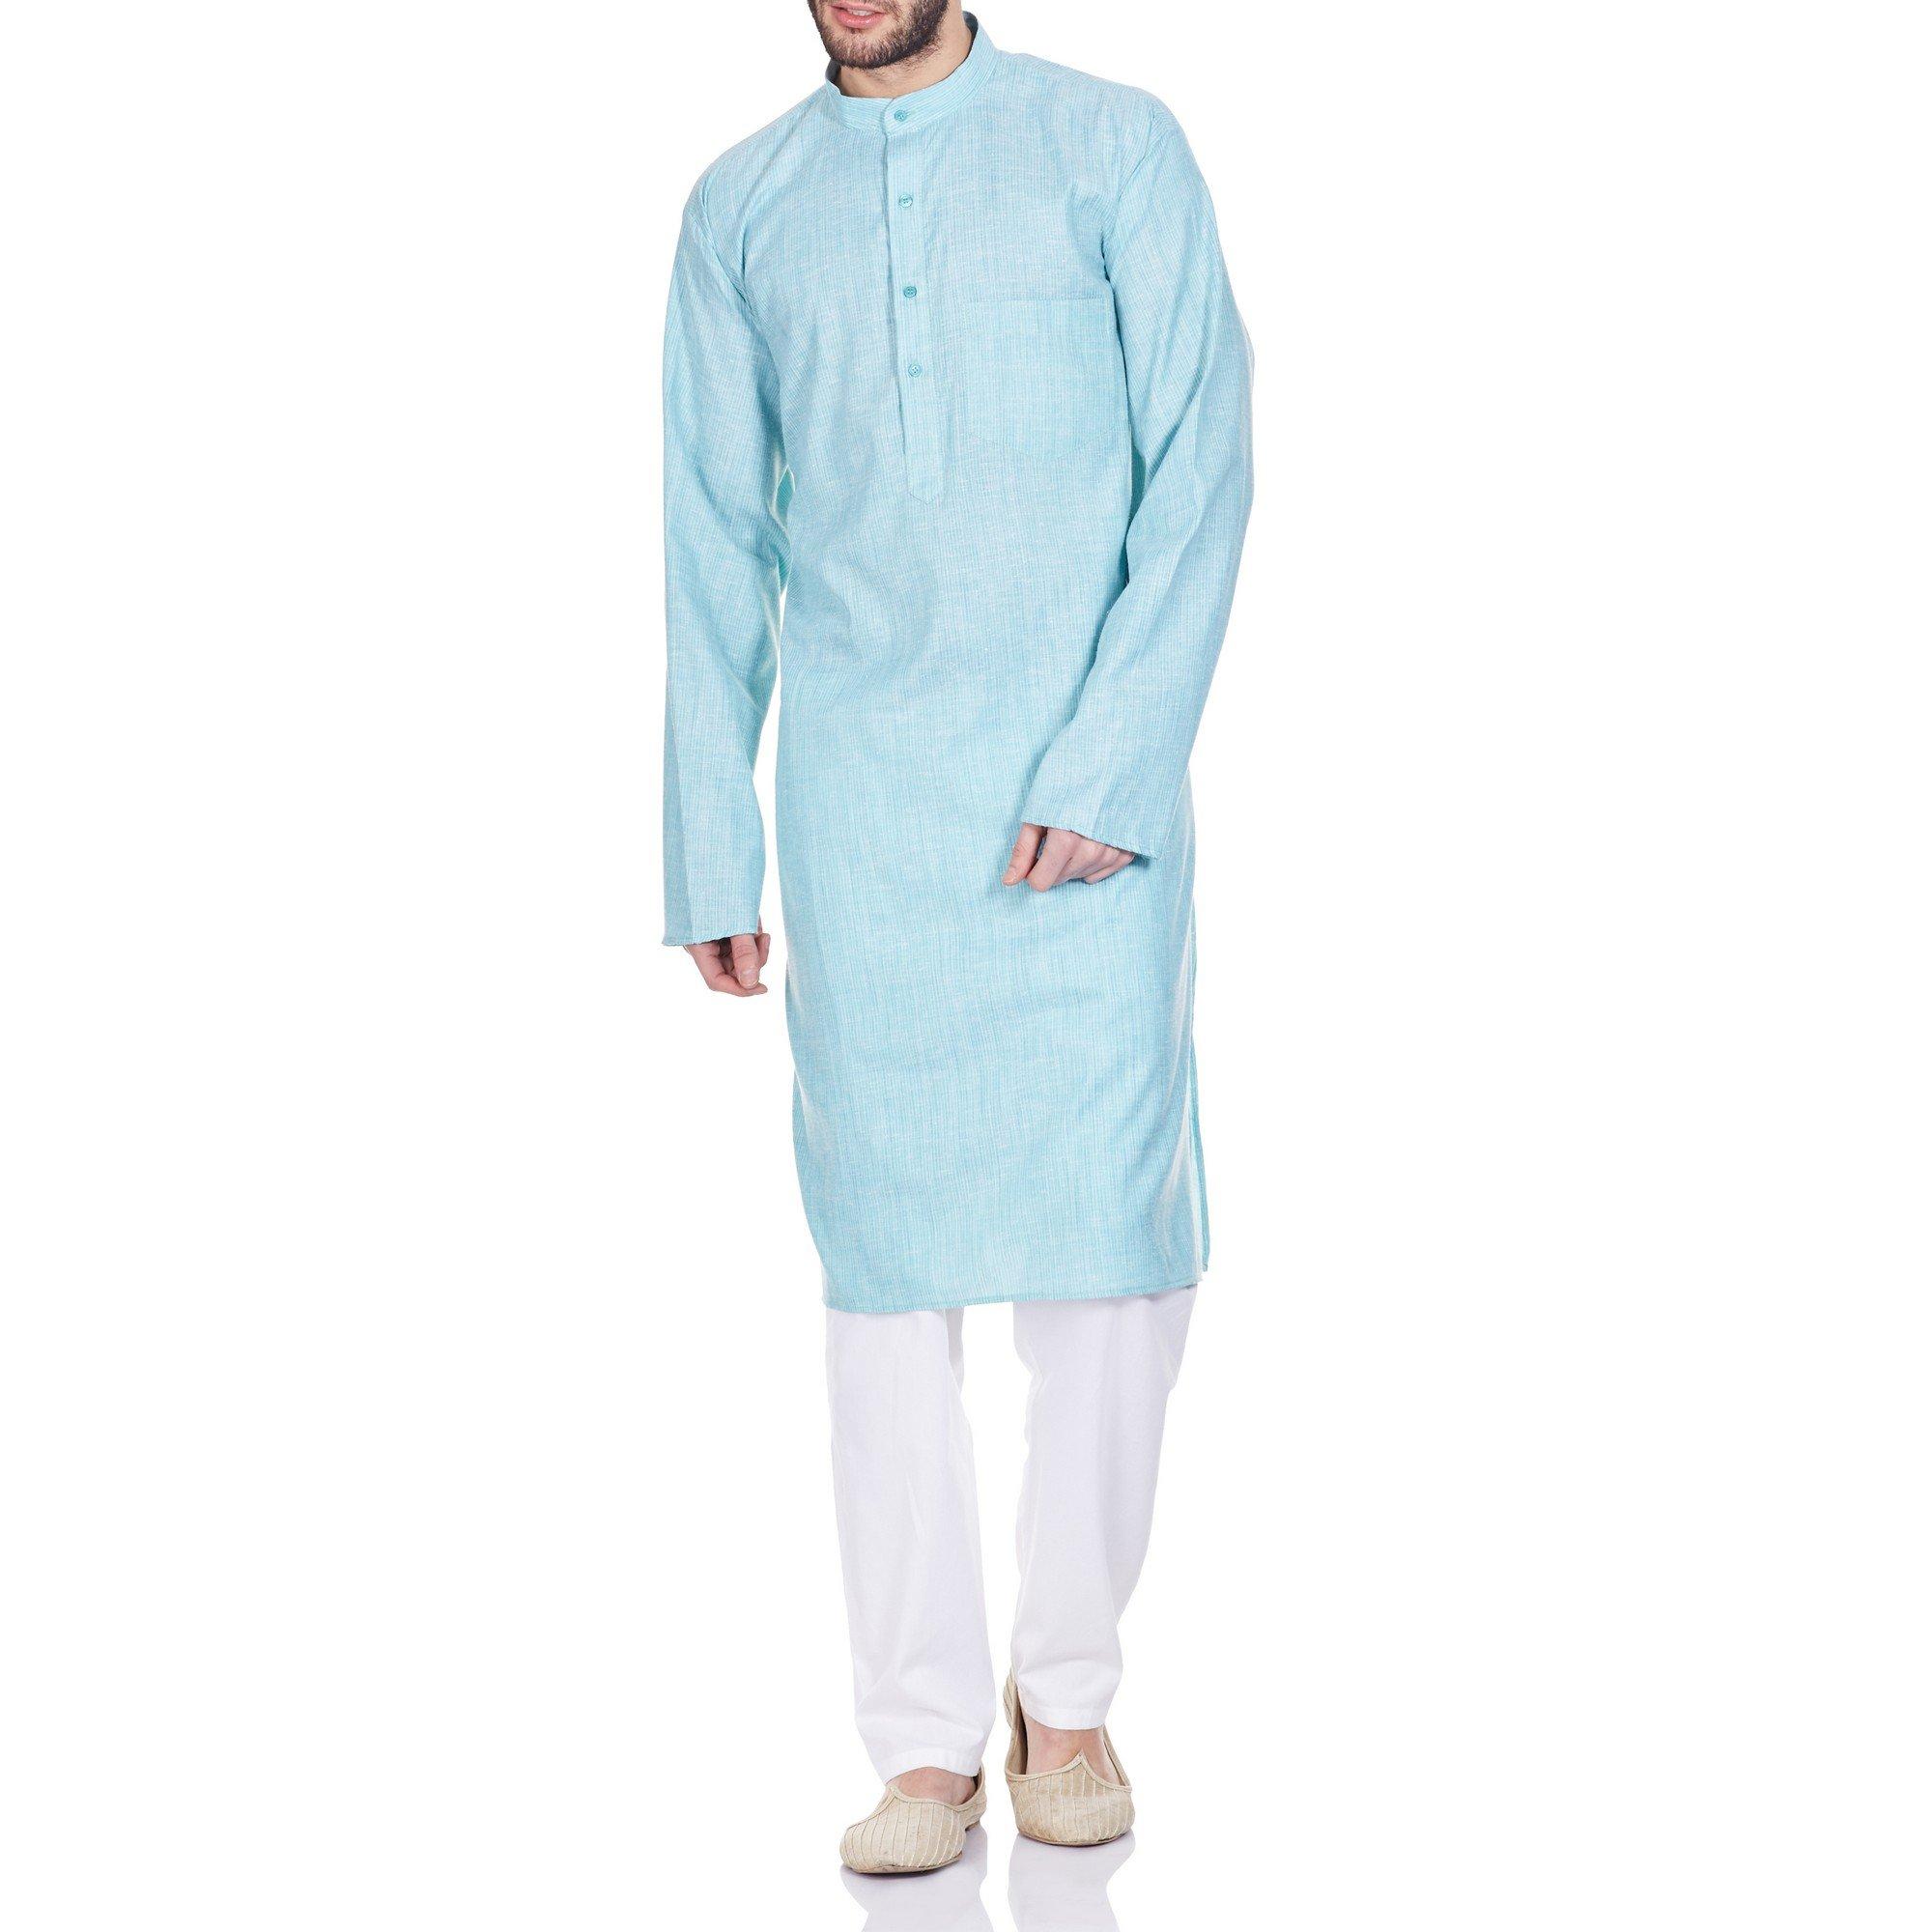 Comfortable Kurta Pajama Set For Men,Indian Dress Gifts For Grandpa 44 Inches